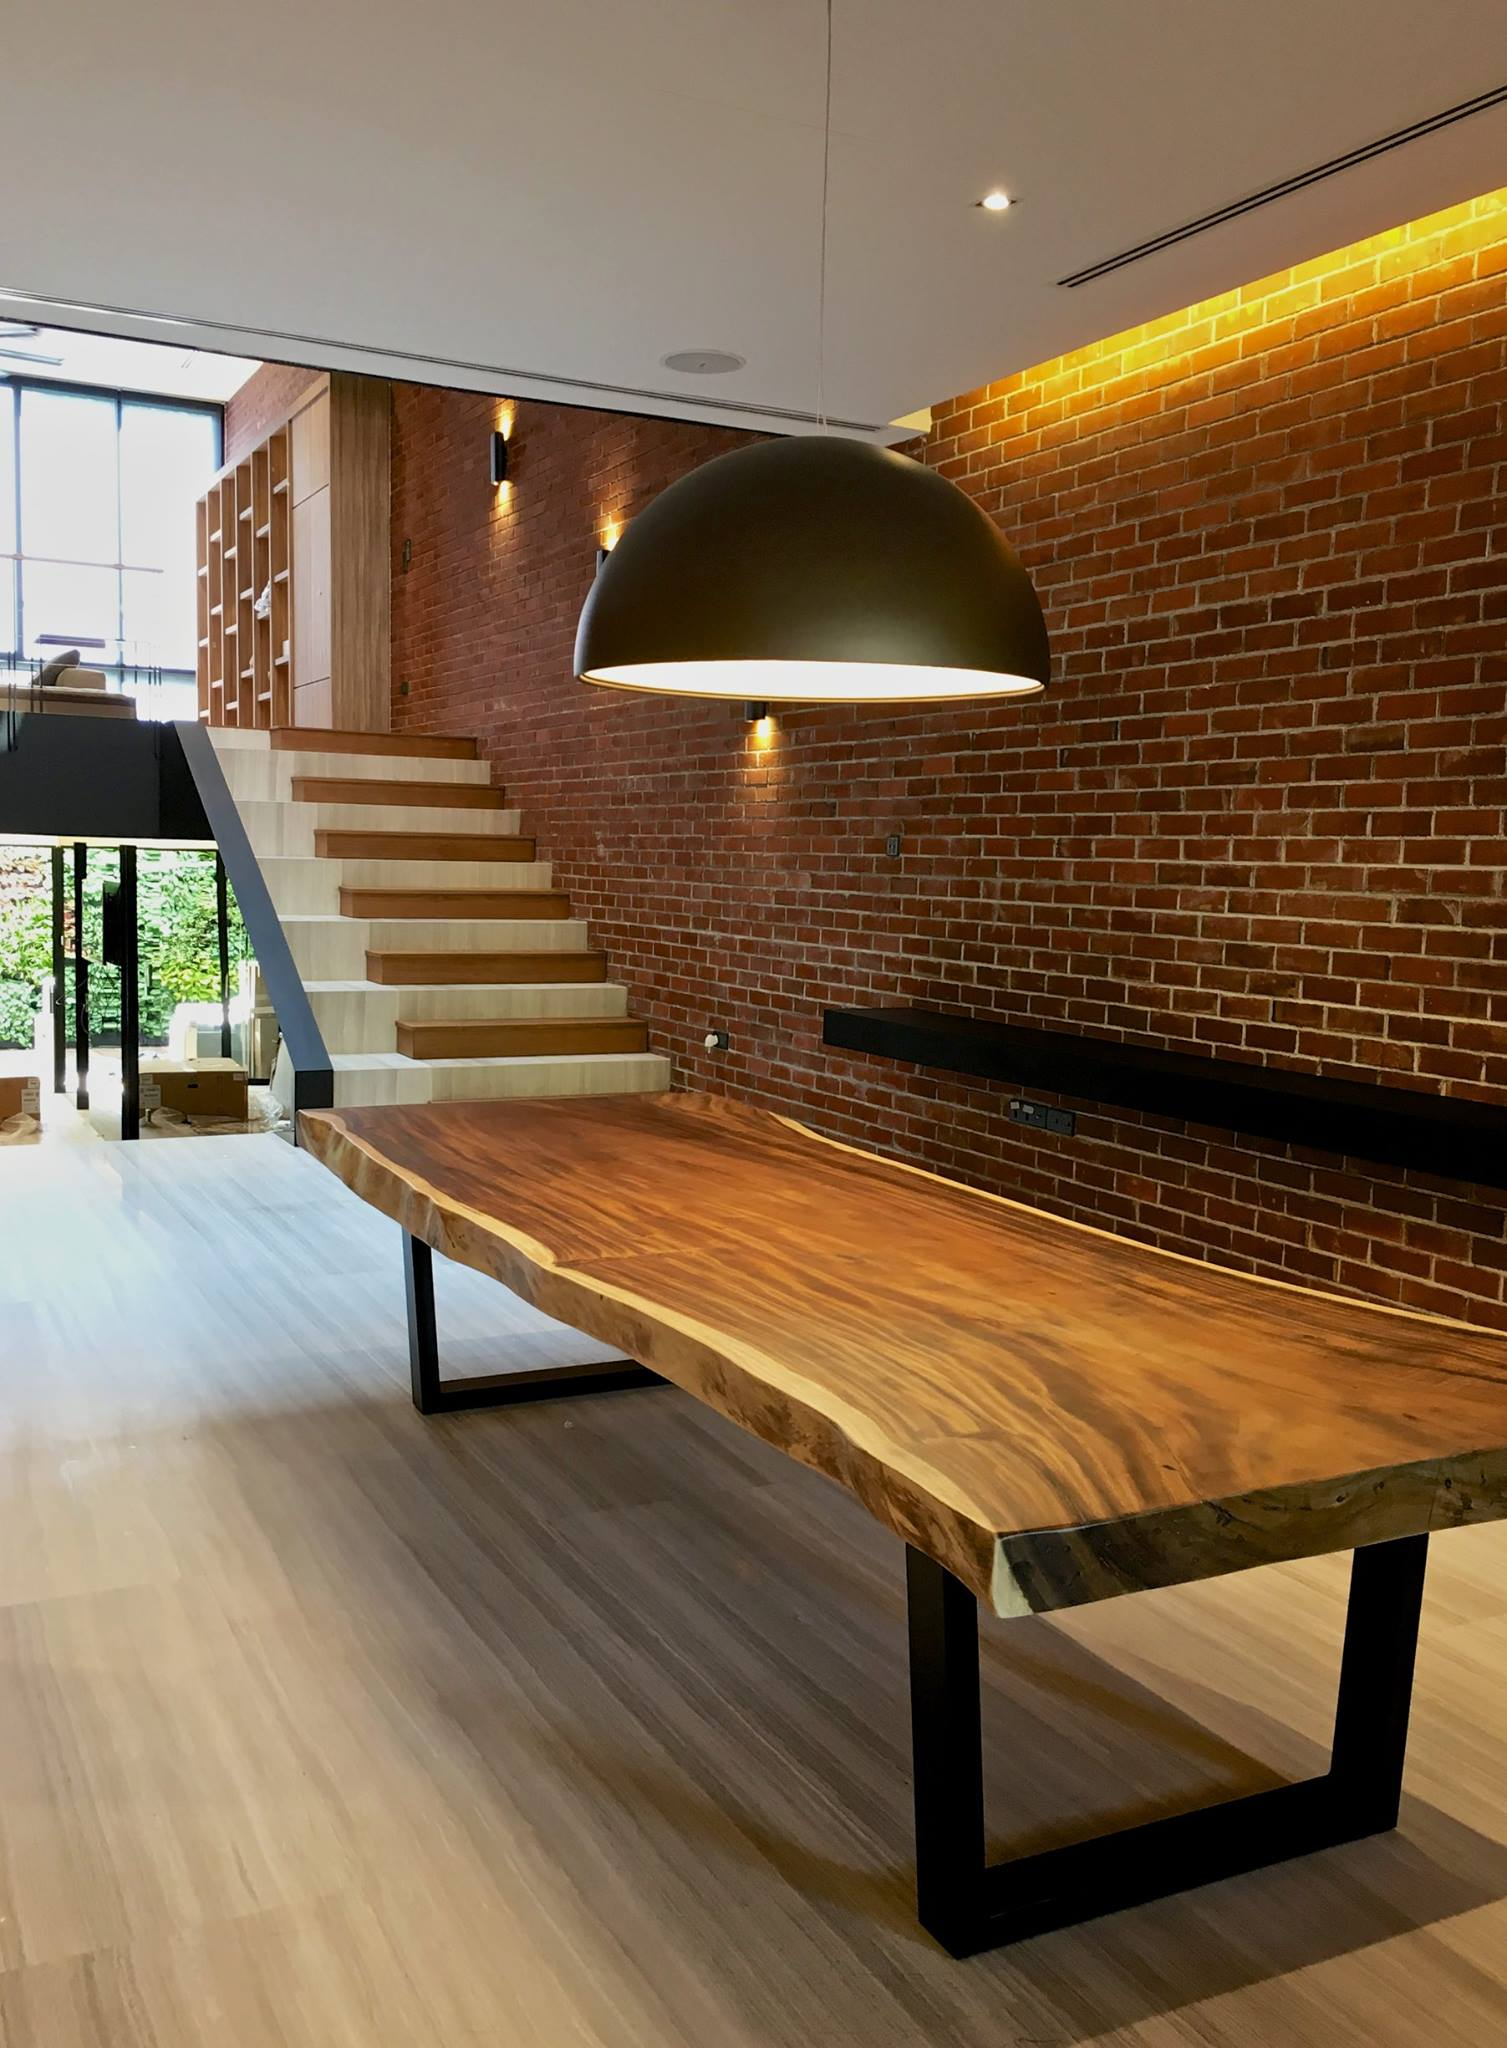 Suar Wood Long Dining Table // Herman Furniture Singapore.jpg